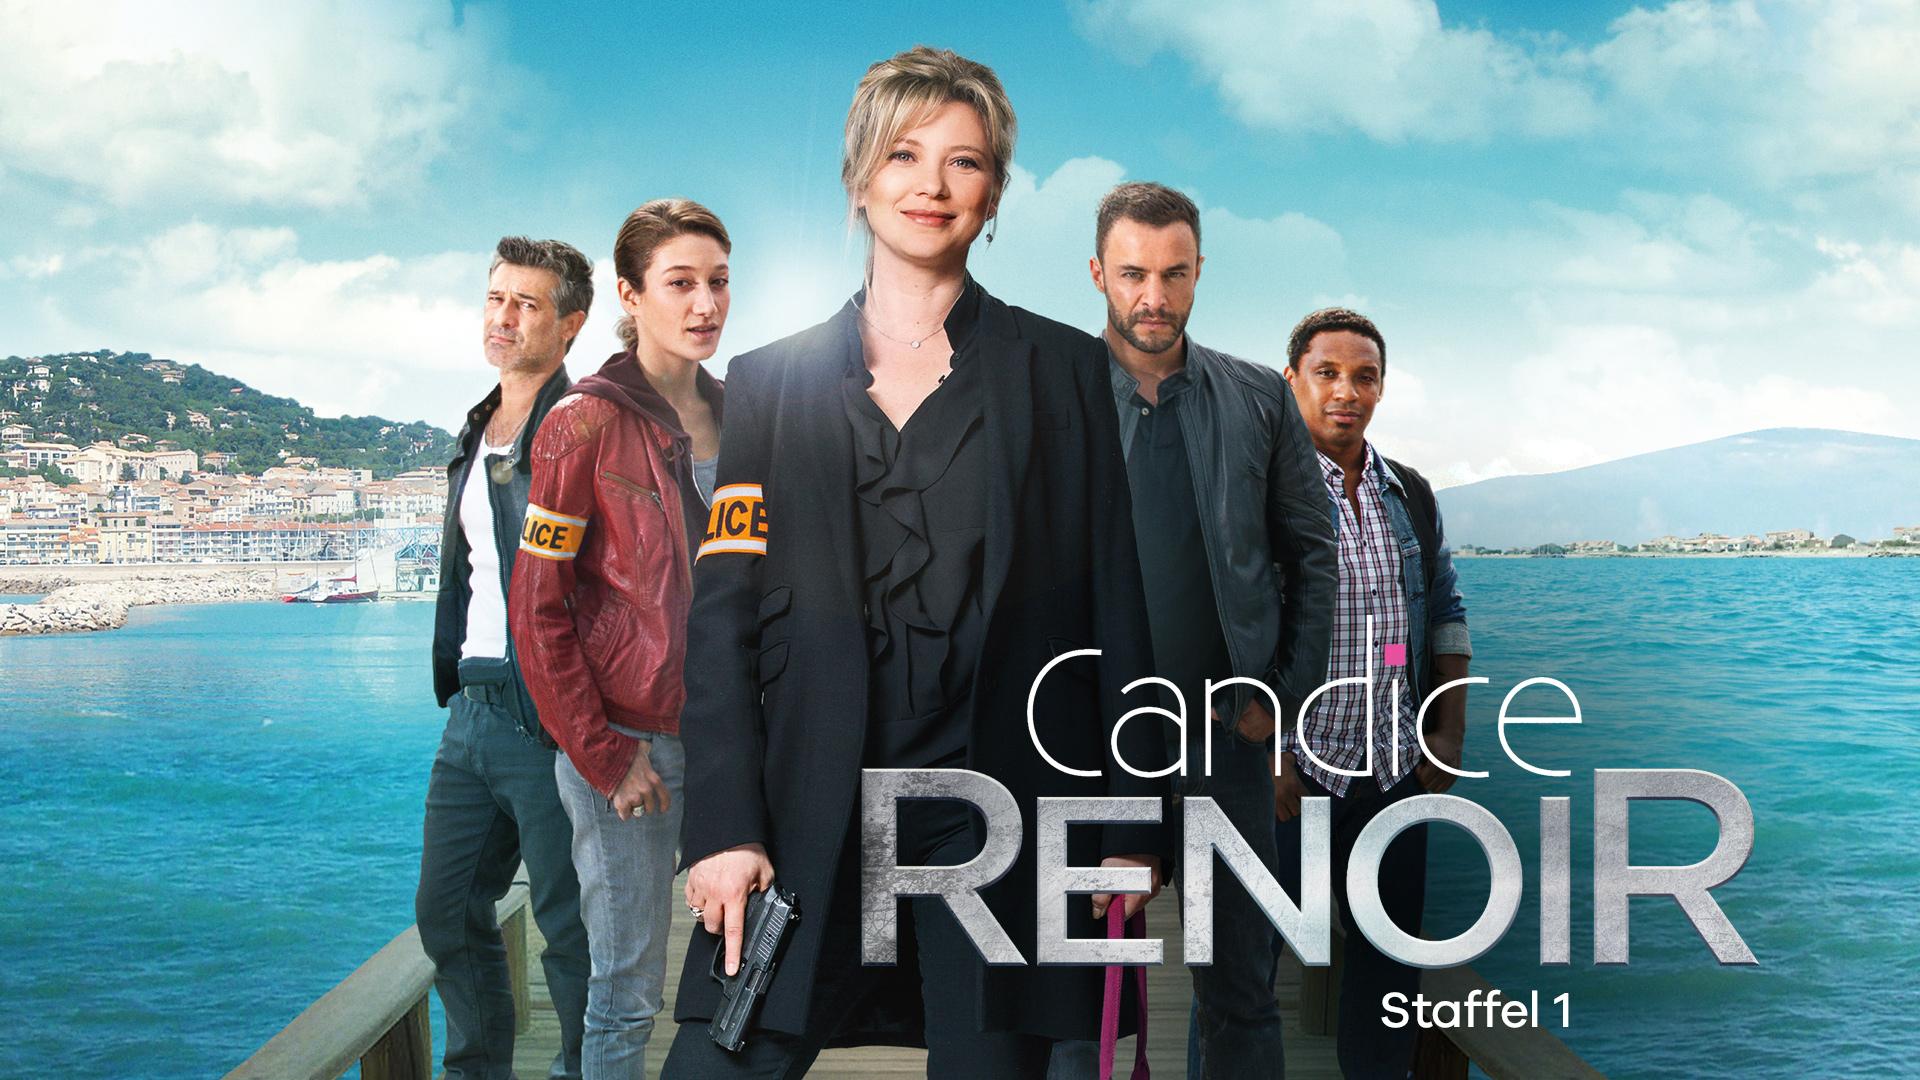 Candice Renoir - Staffel 1